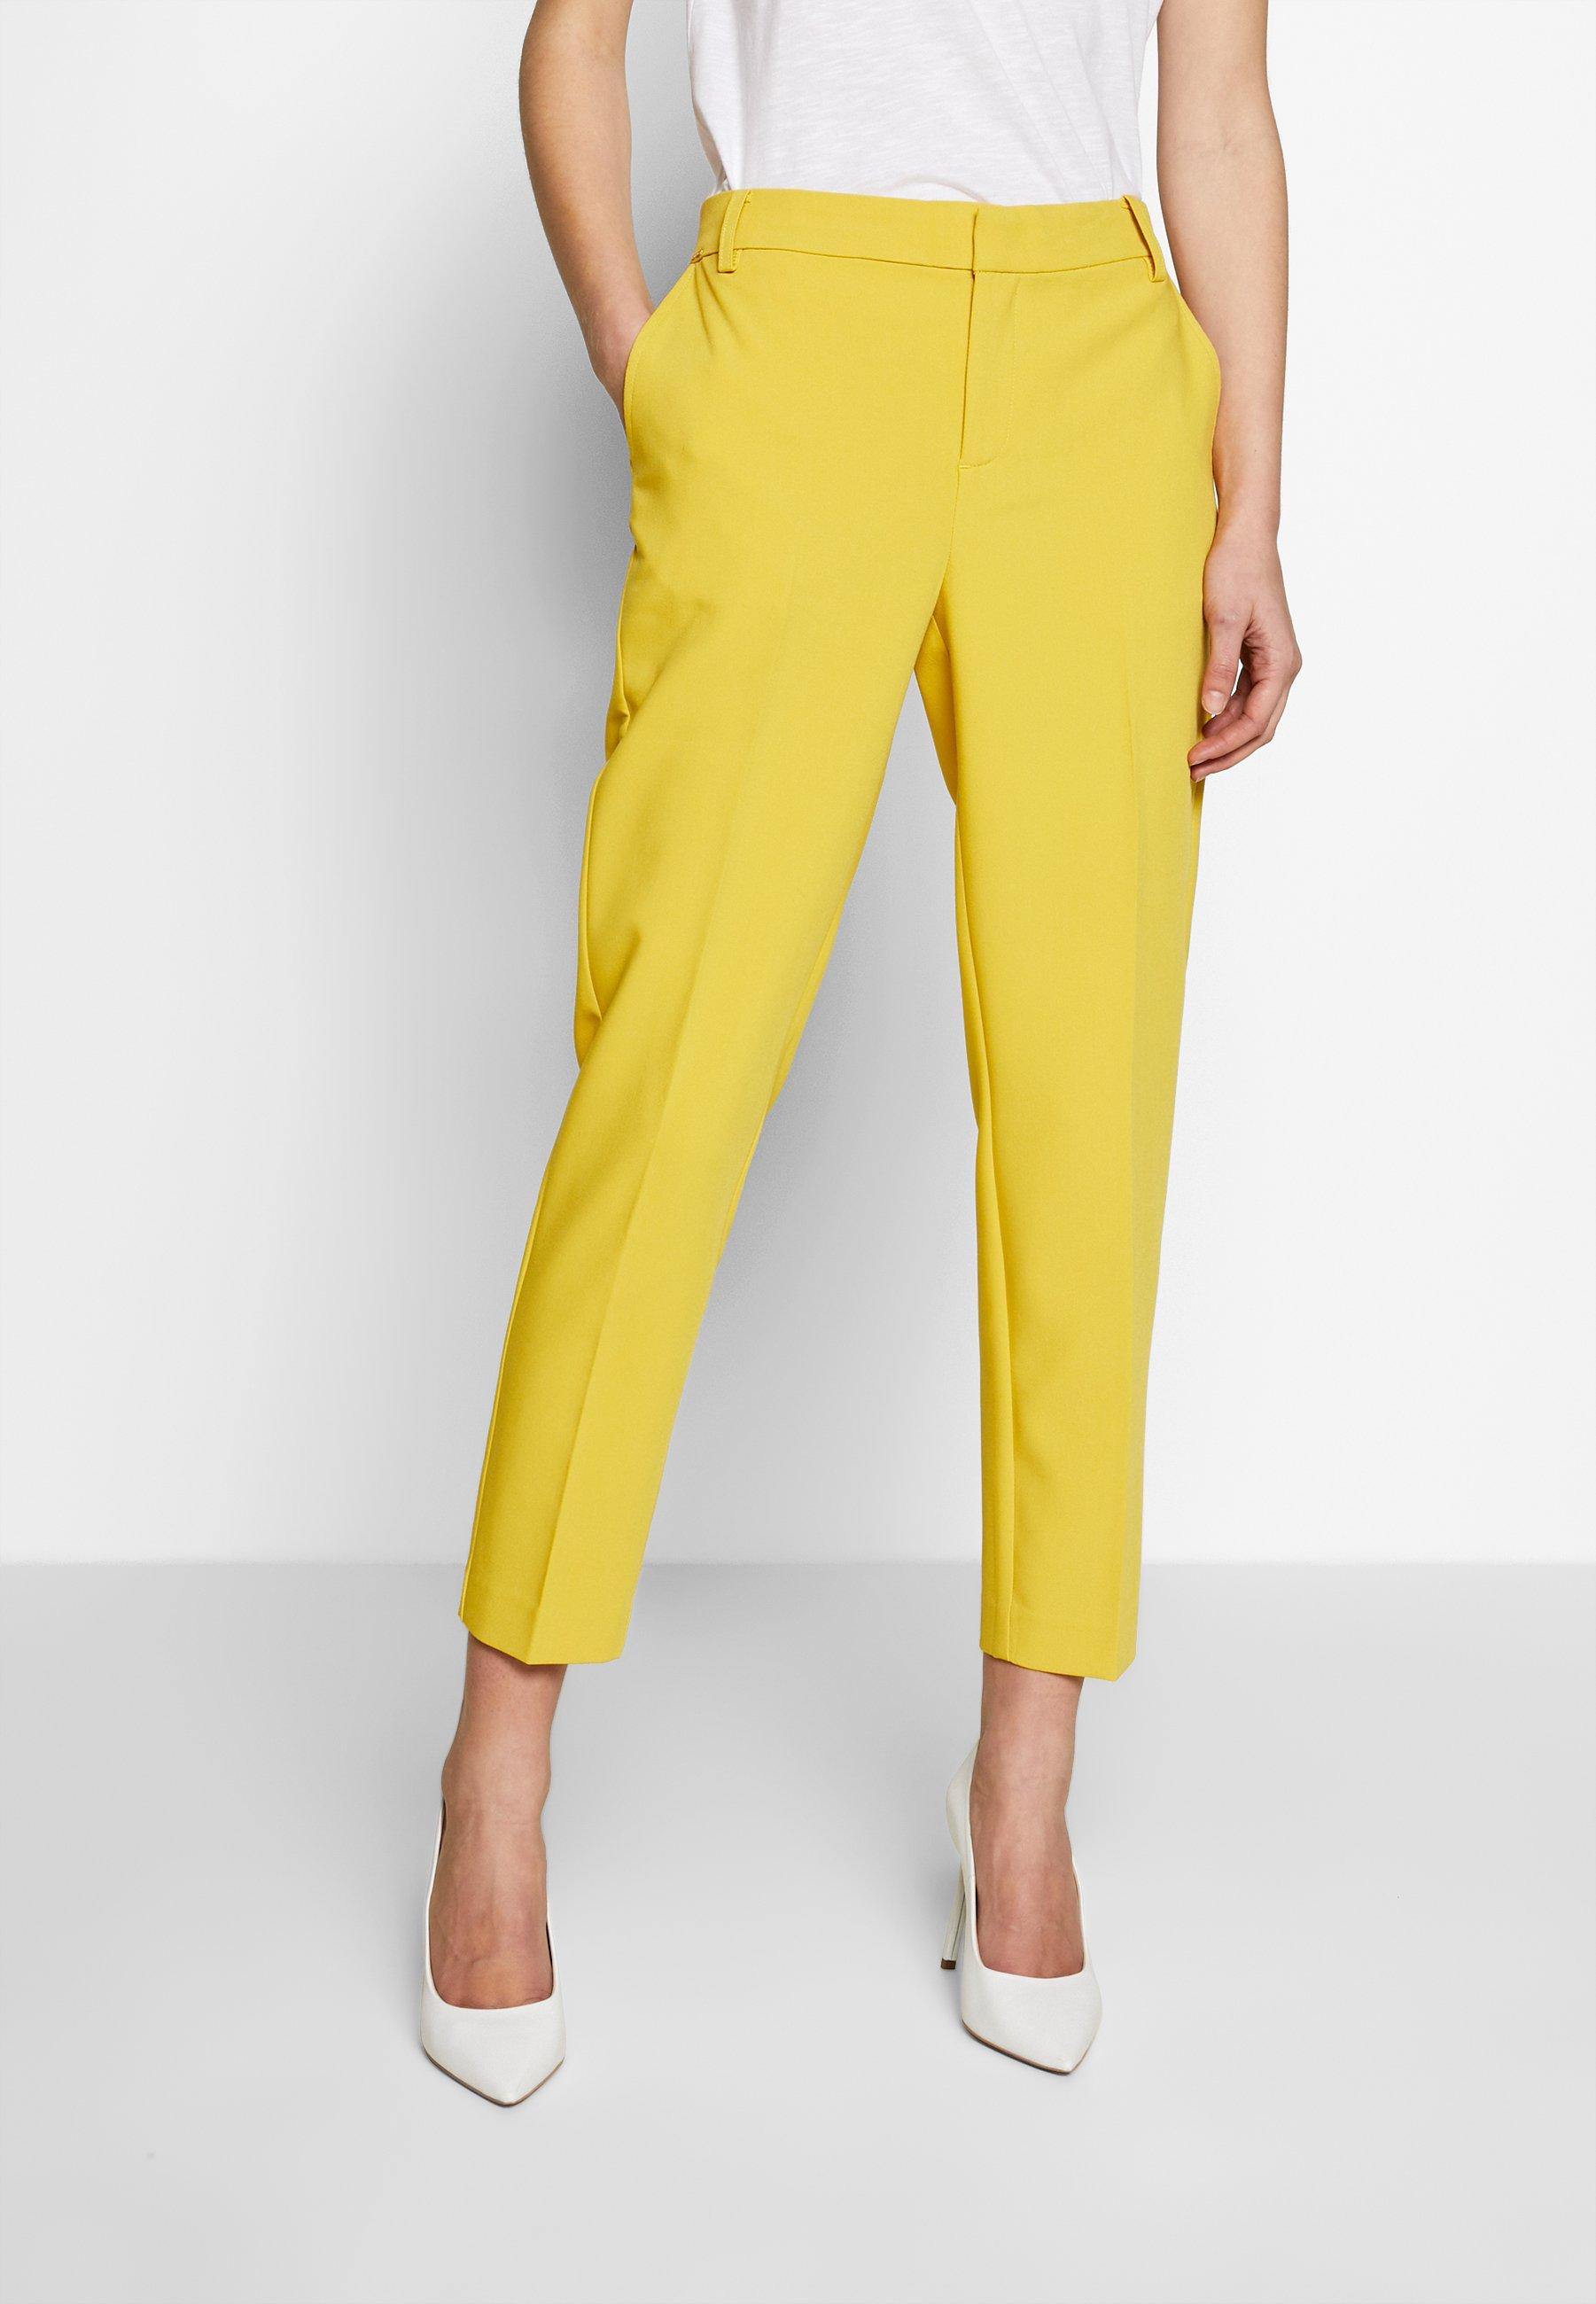 Bukse ceylon yellow